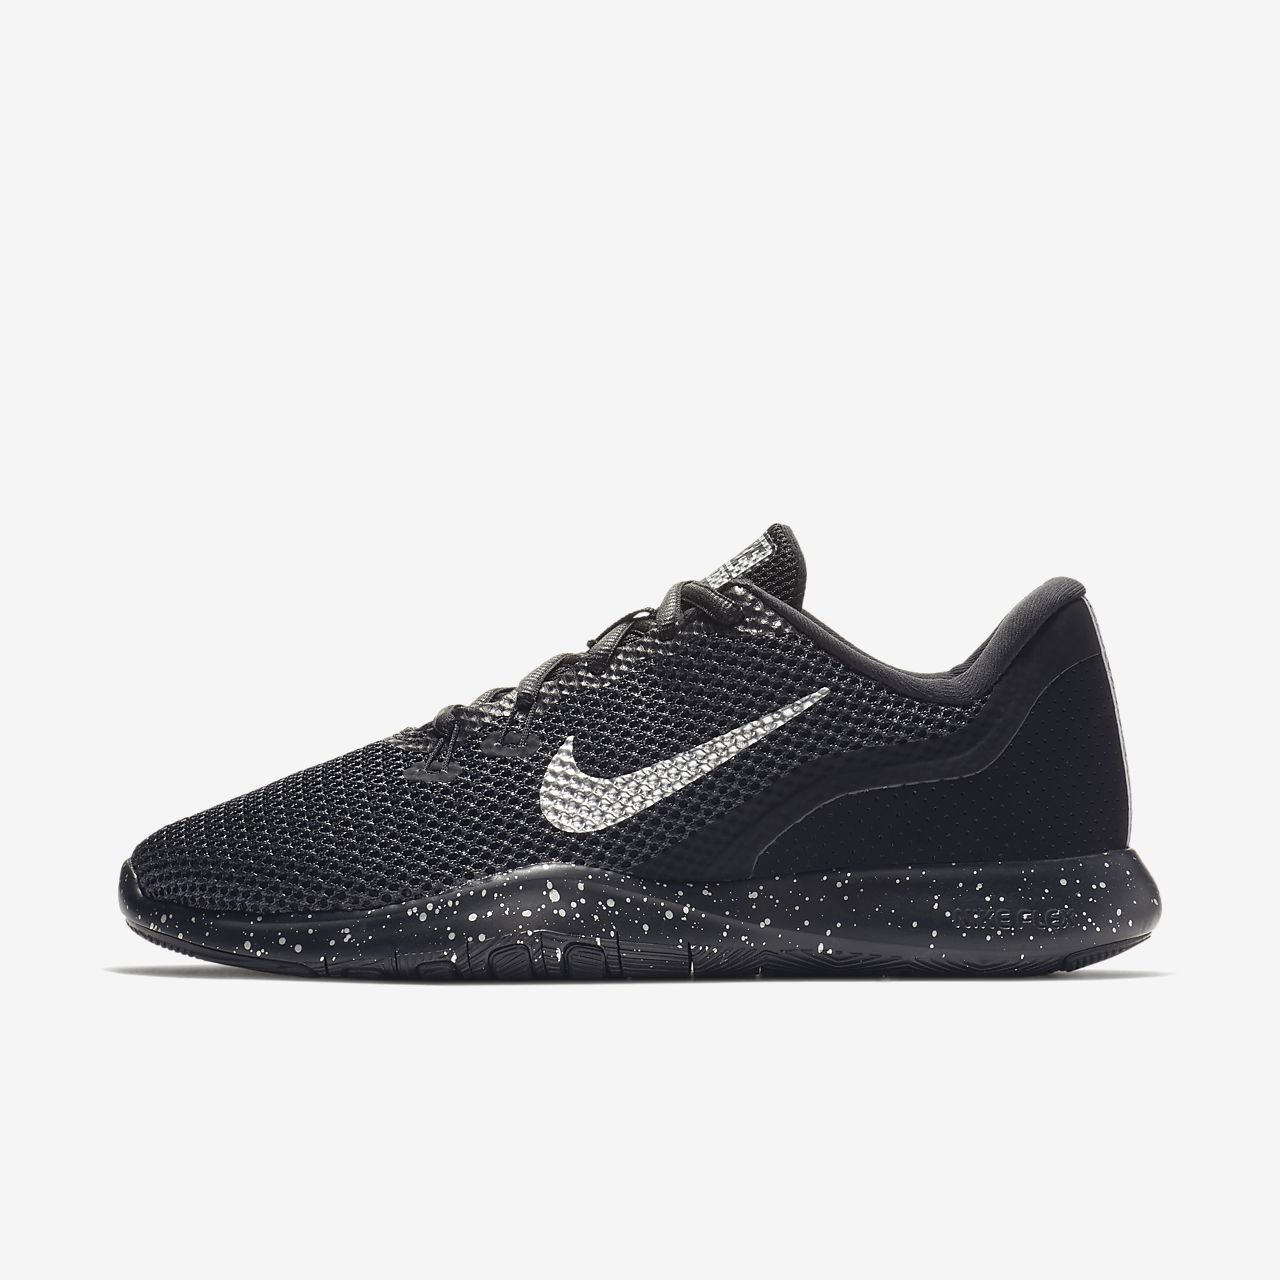 new arrive b7932 83eb0 ... Nike Flex TR 7 Premium Damen-Trainingsschuh